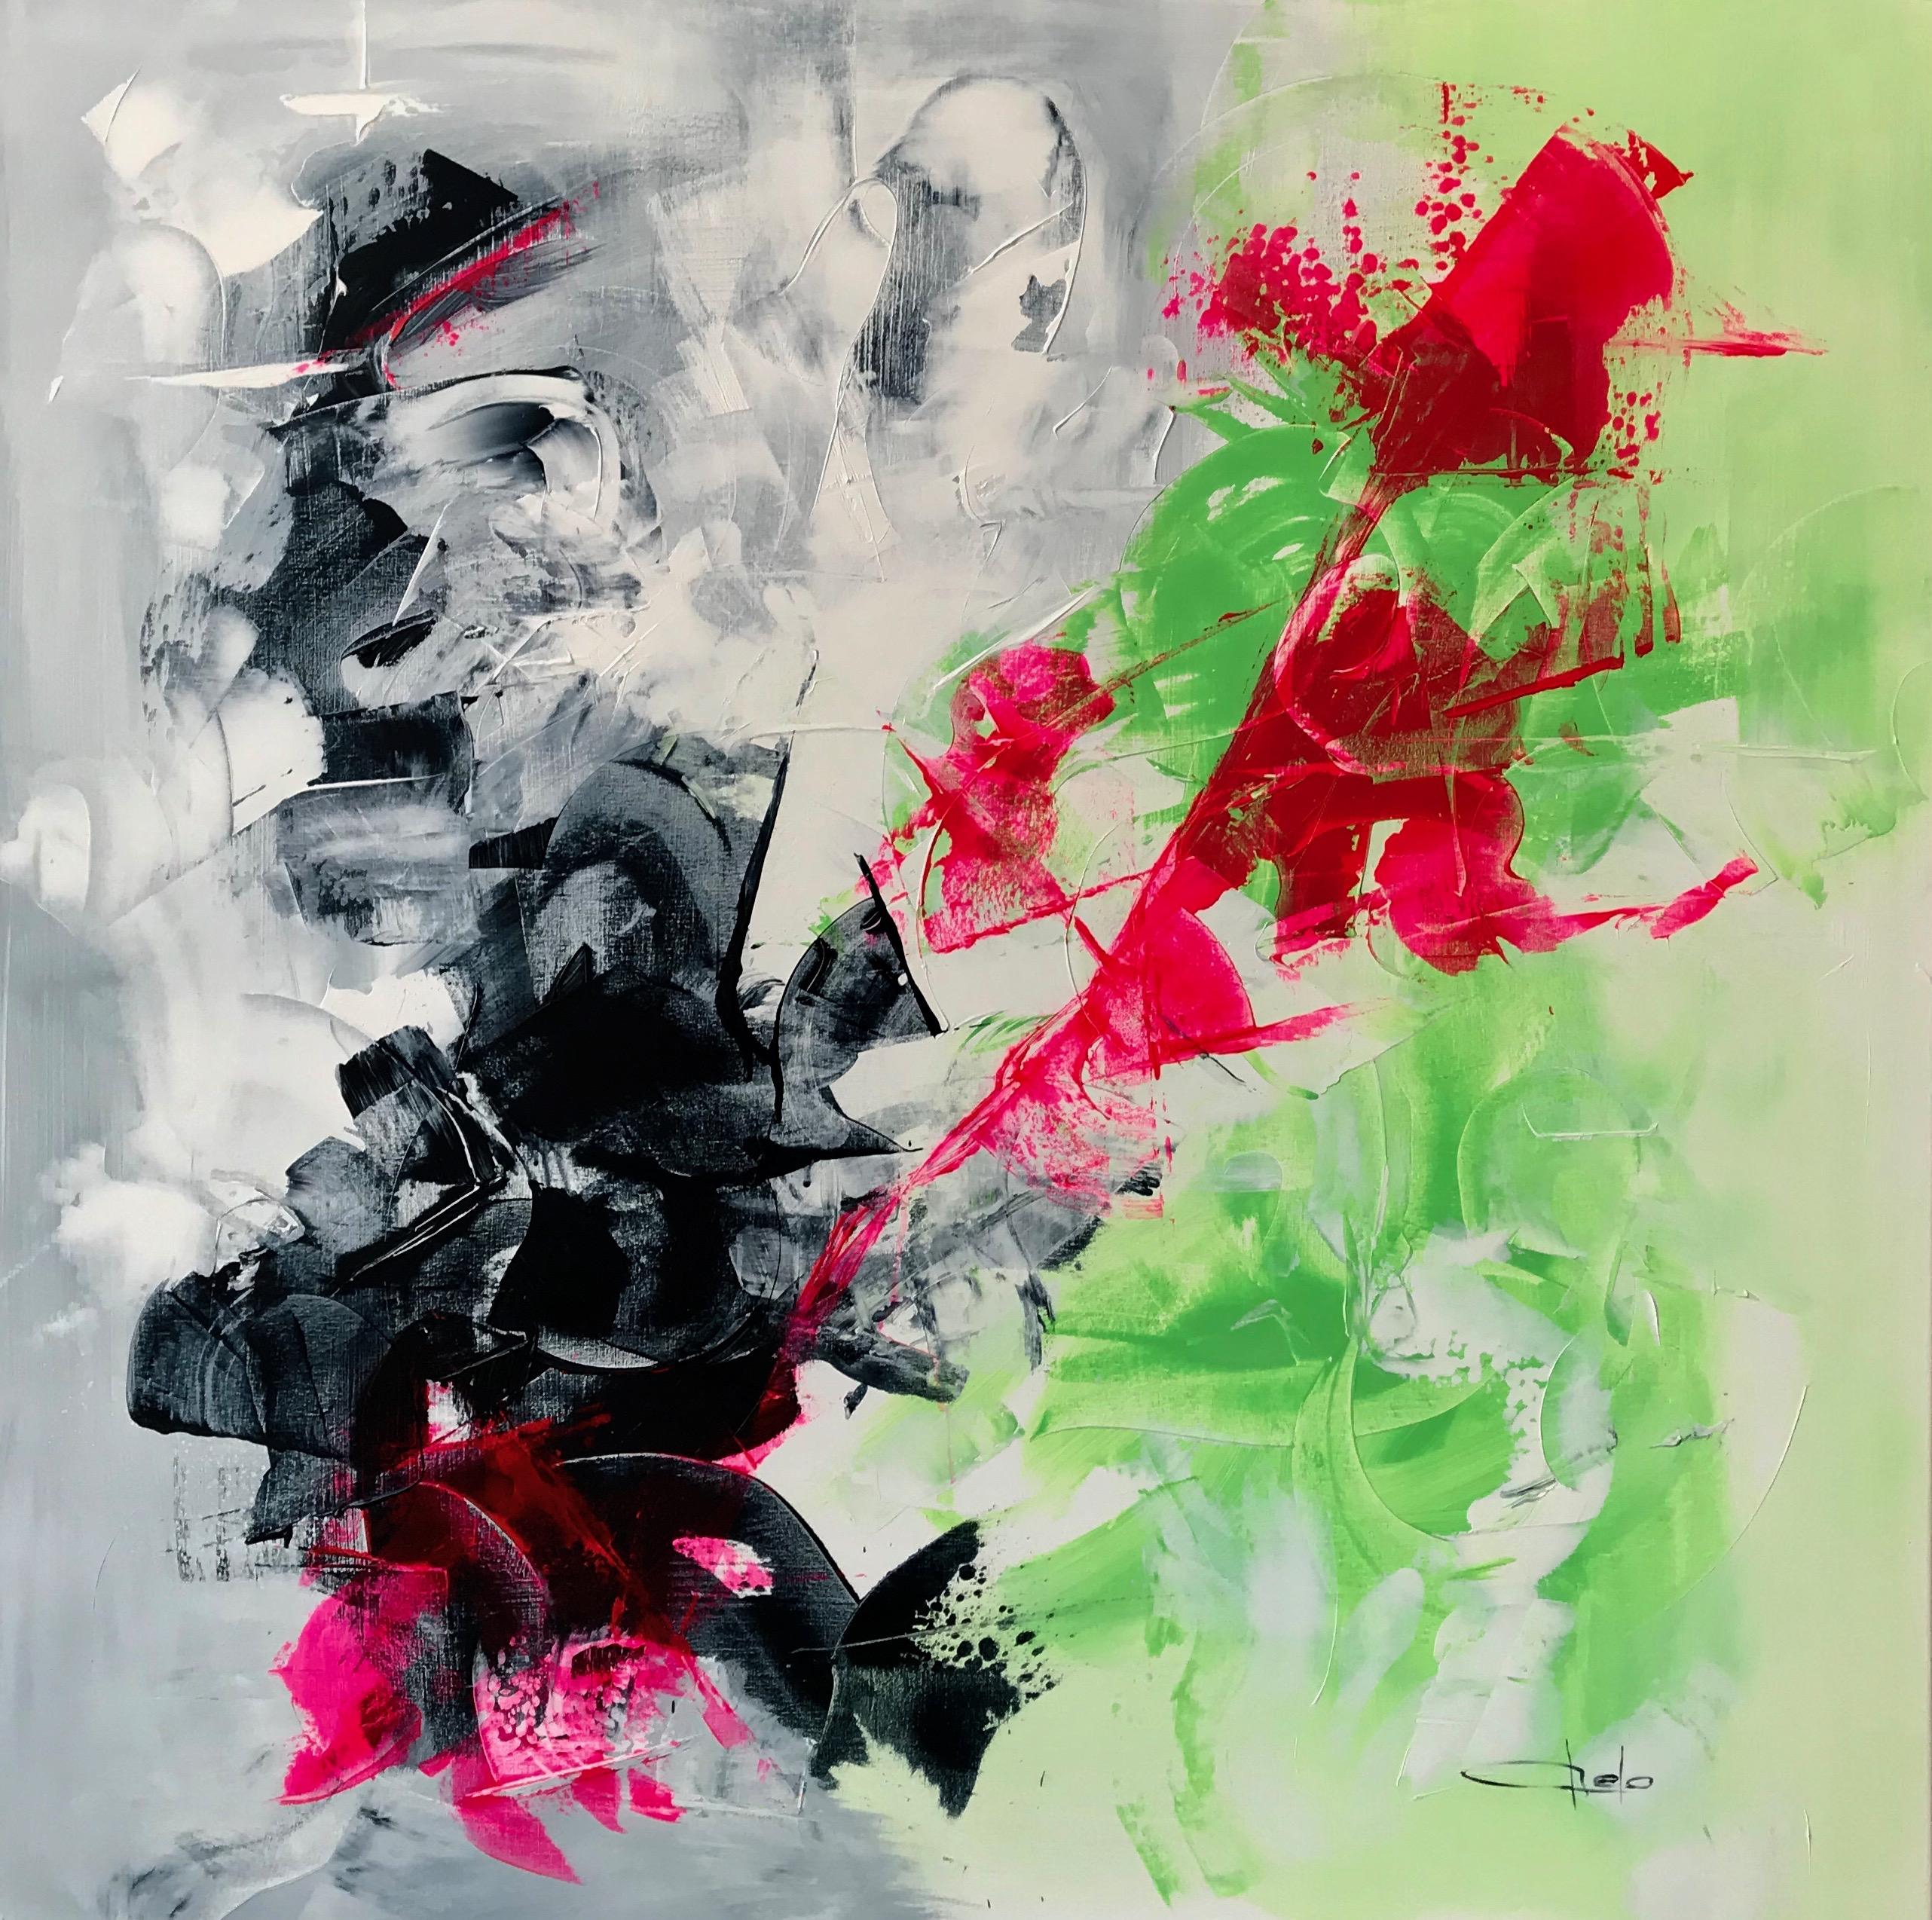 """Abstracto colores esgrafiado"""